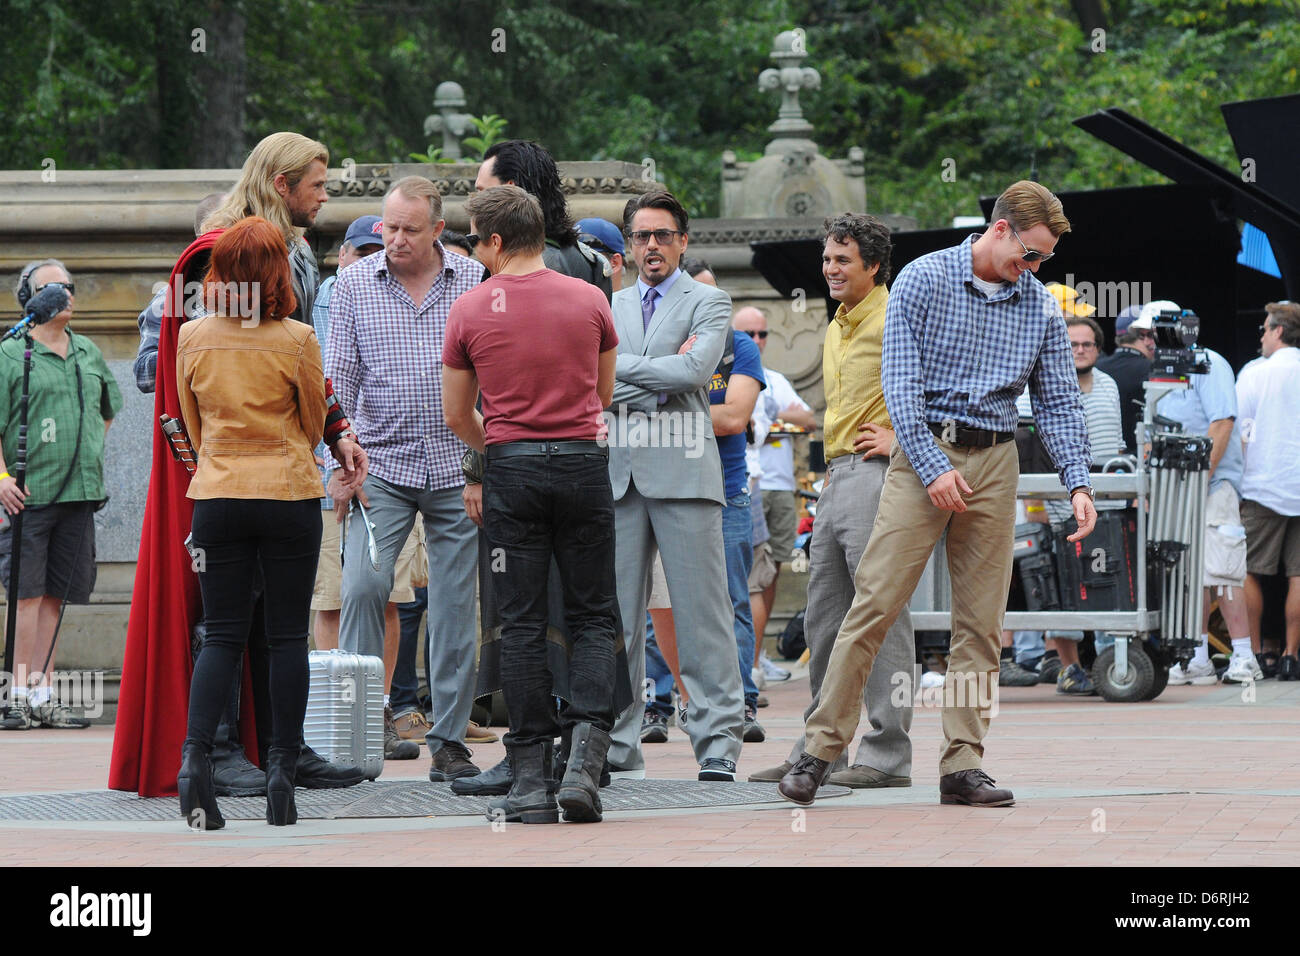 Chris Hemsworth Scarlett Johansson Tom Hiddleston Jeremy Renner Evans Mark Ruffalo Robert Downey Jr On The Film Set